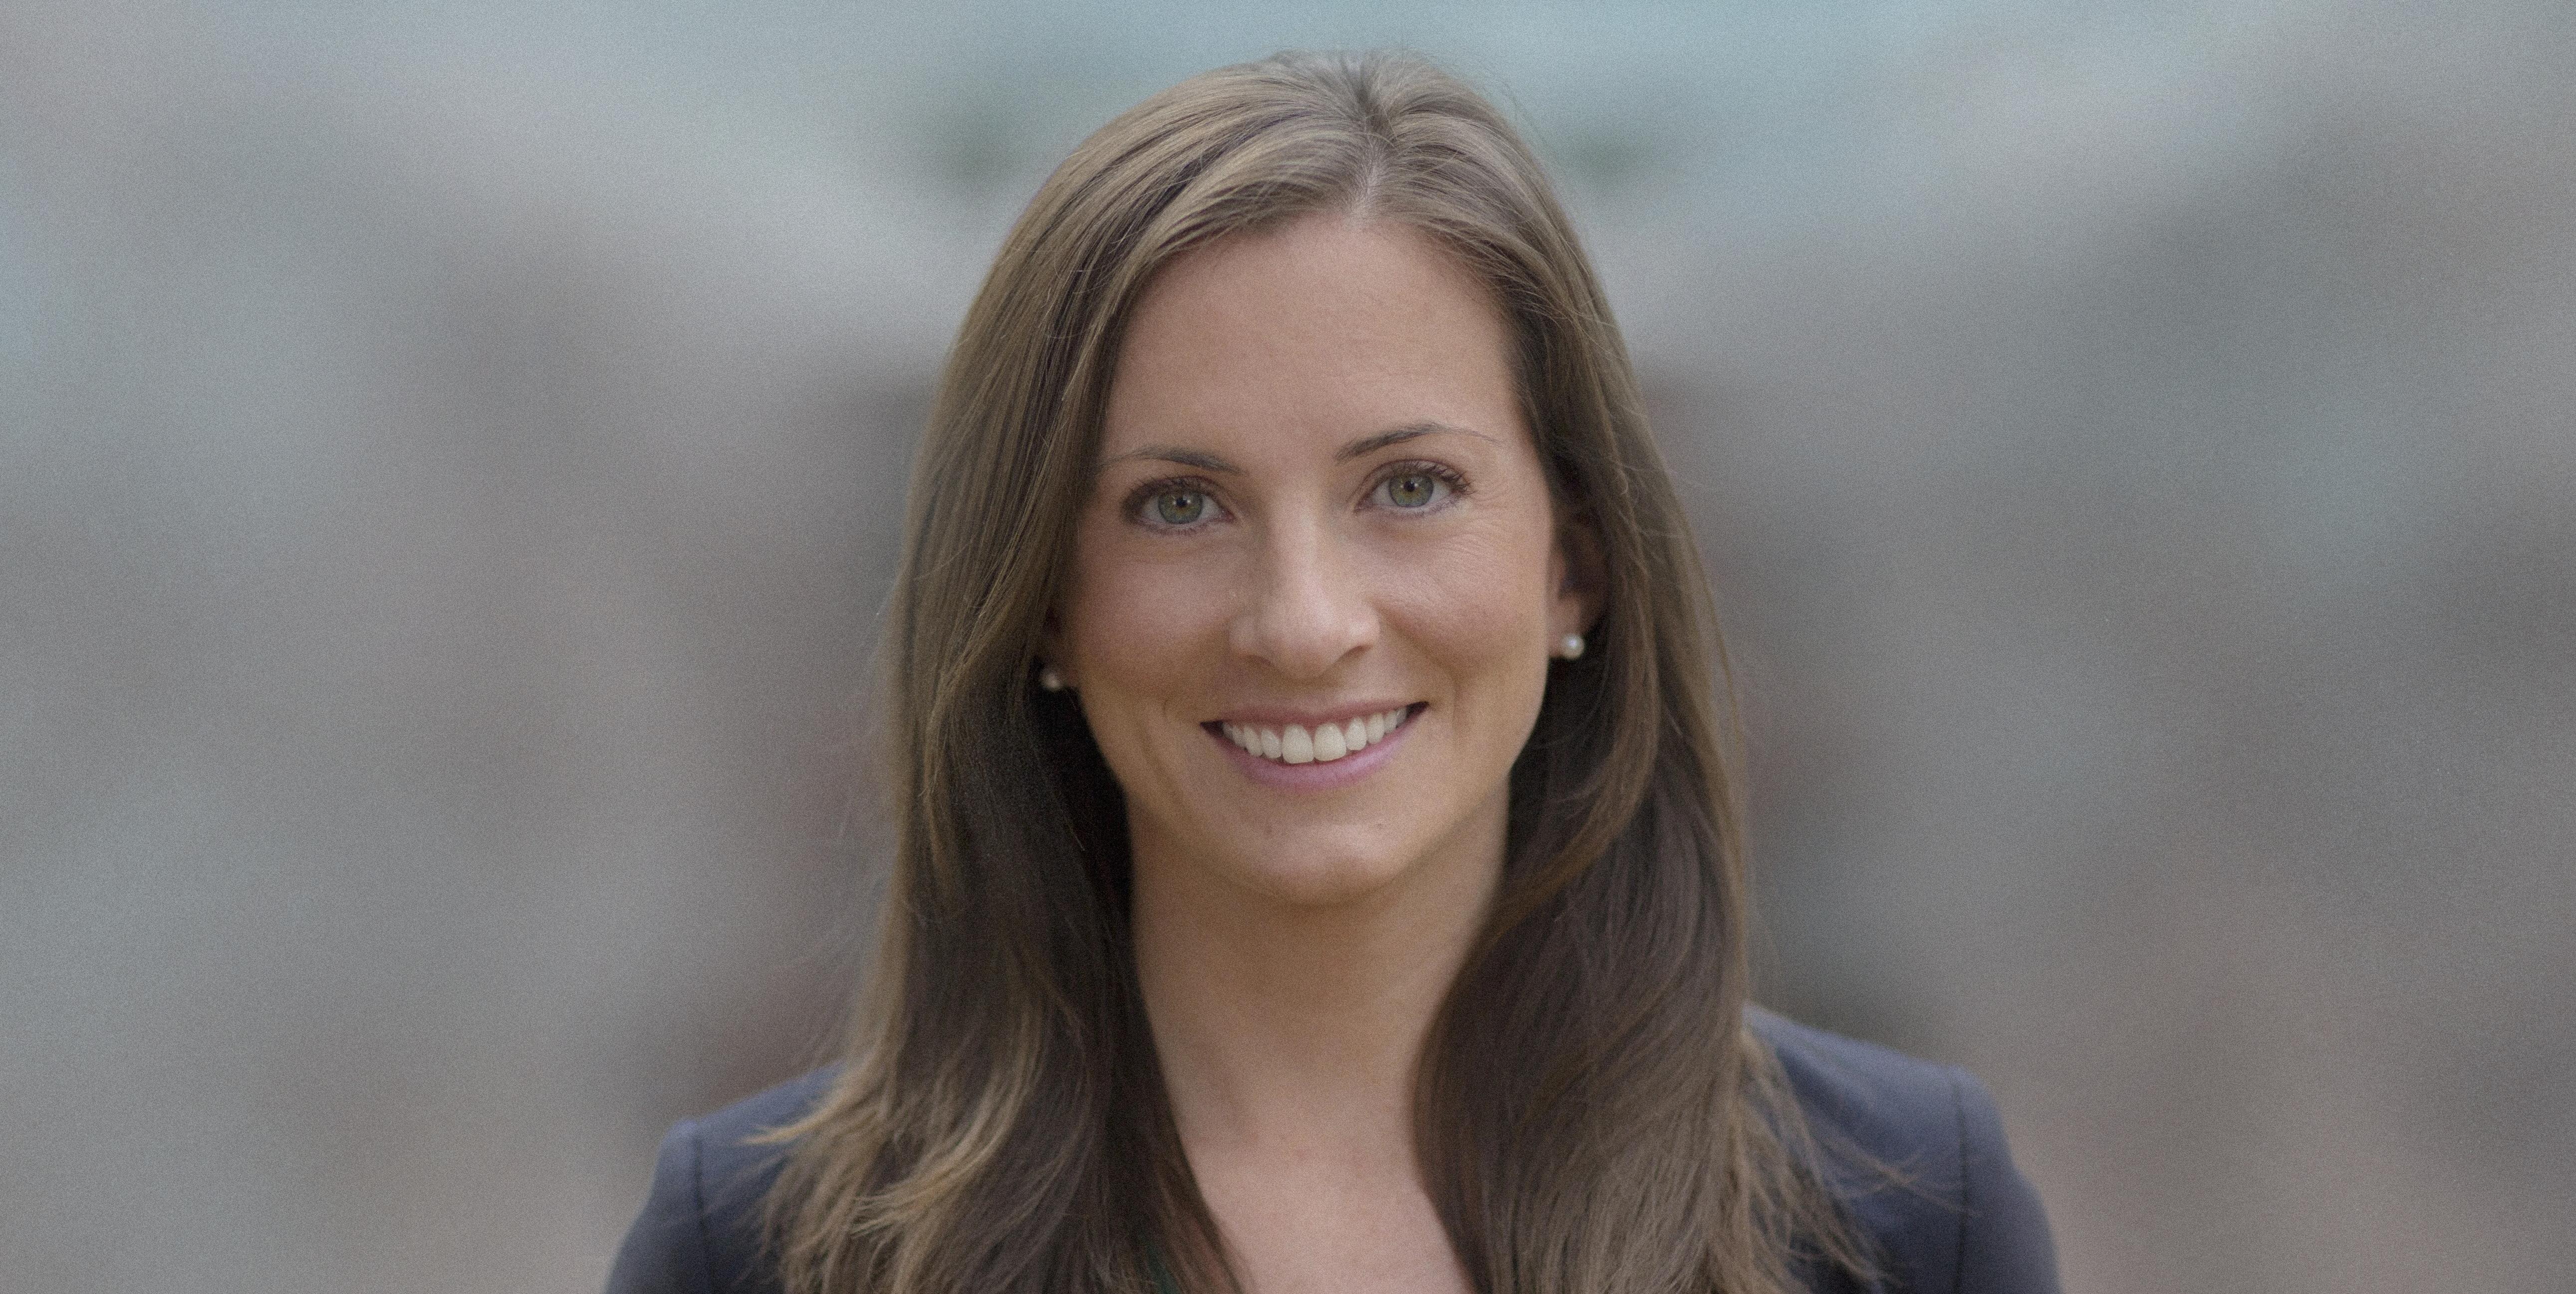 Alison Elworthy Varicent Board of Directors